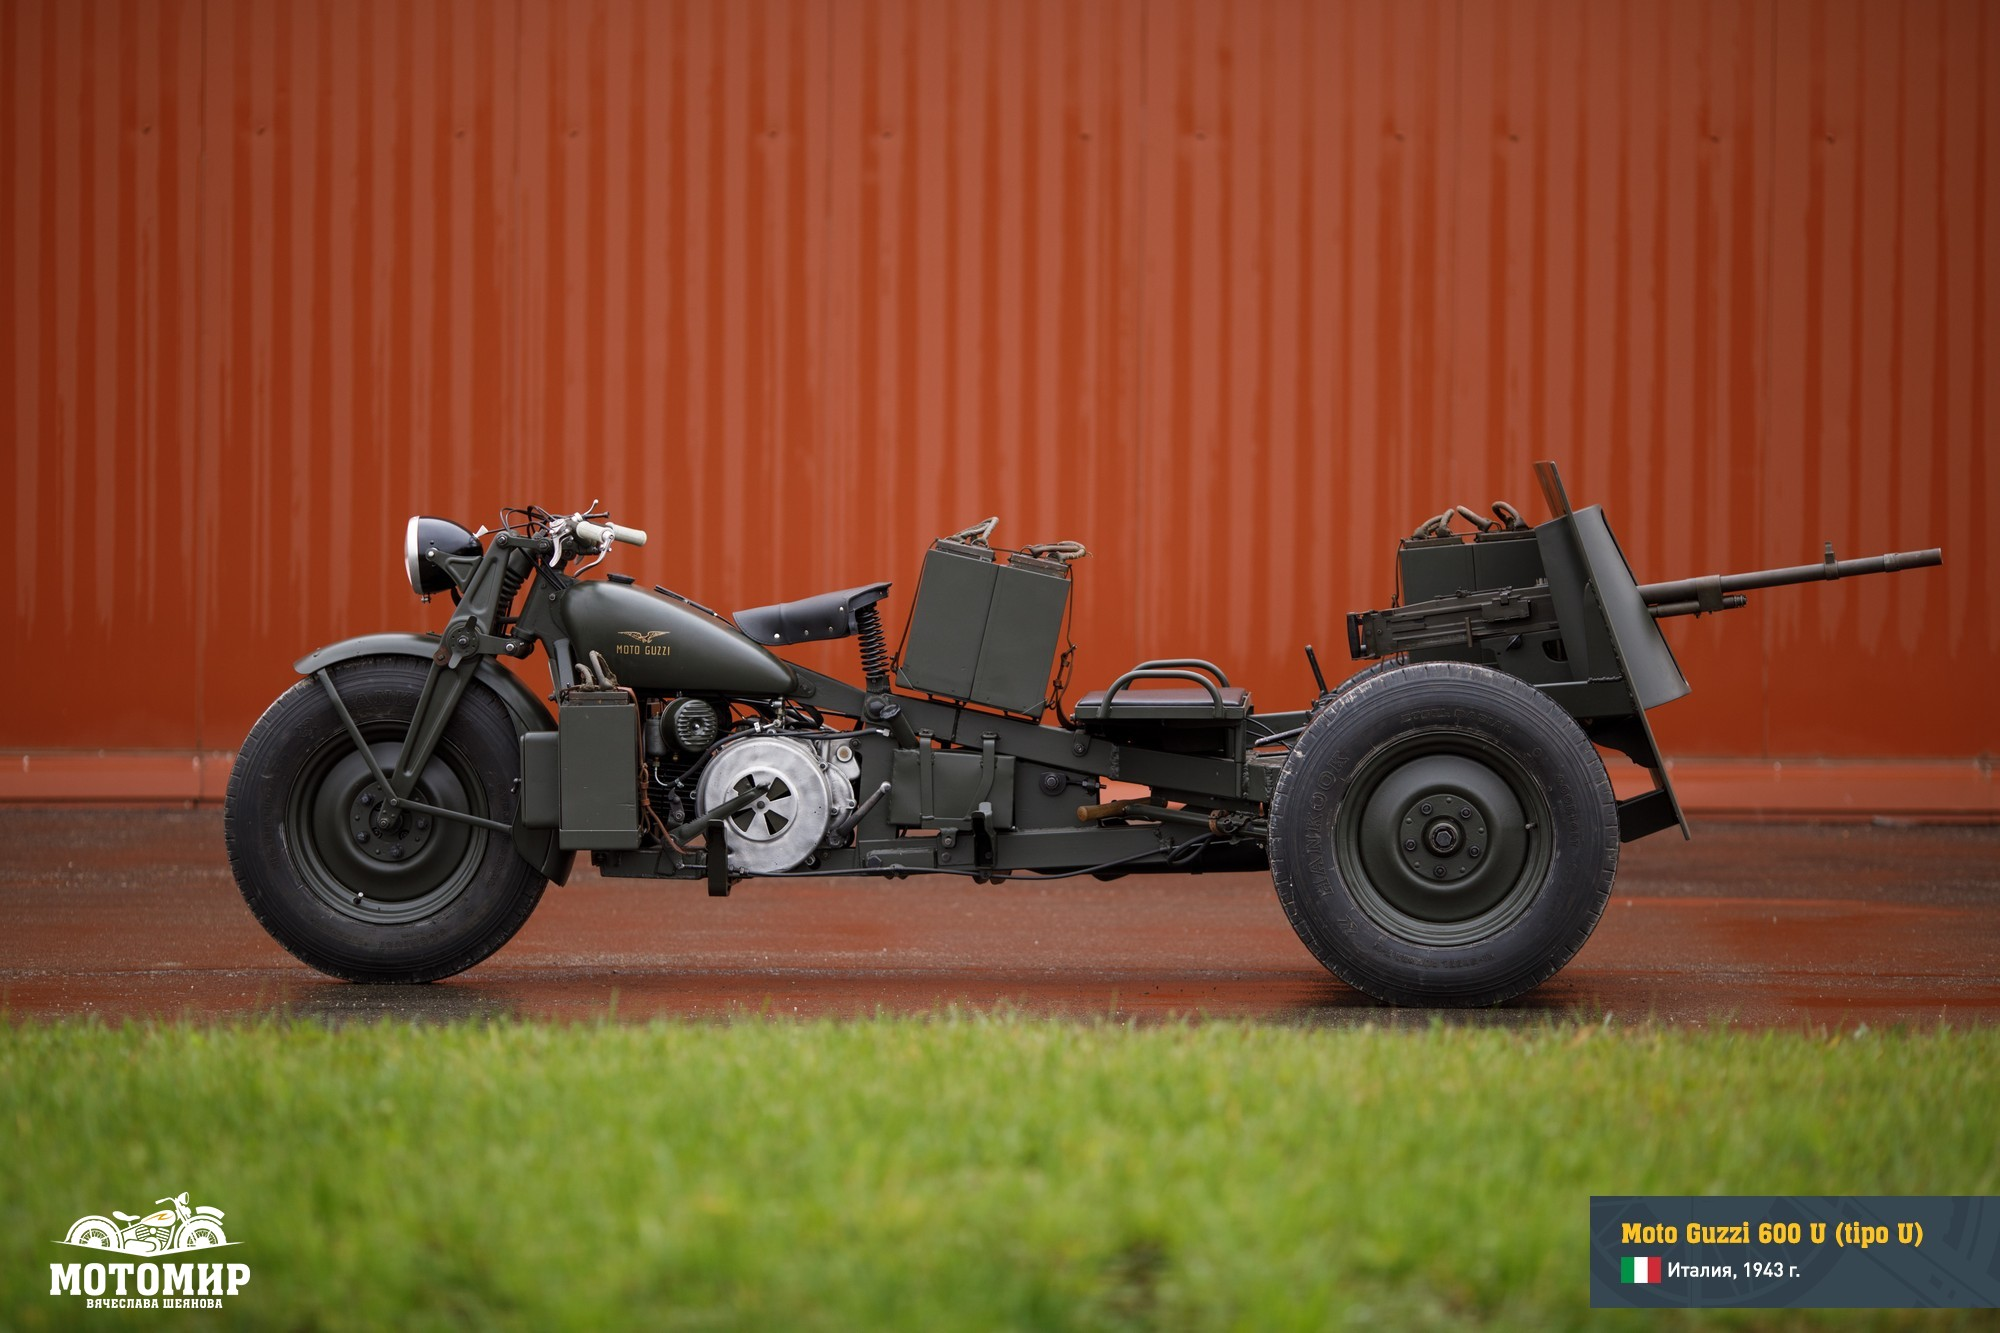 moto-guzzi-600-u-web-02